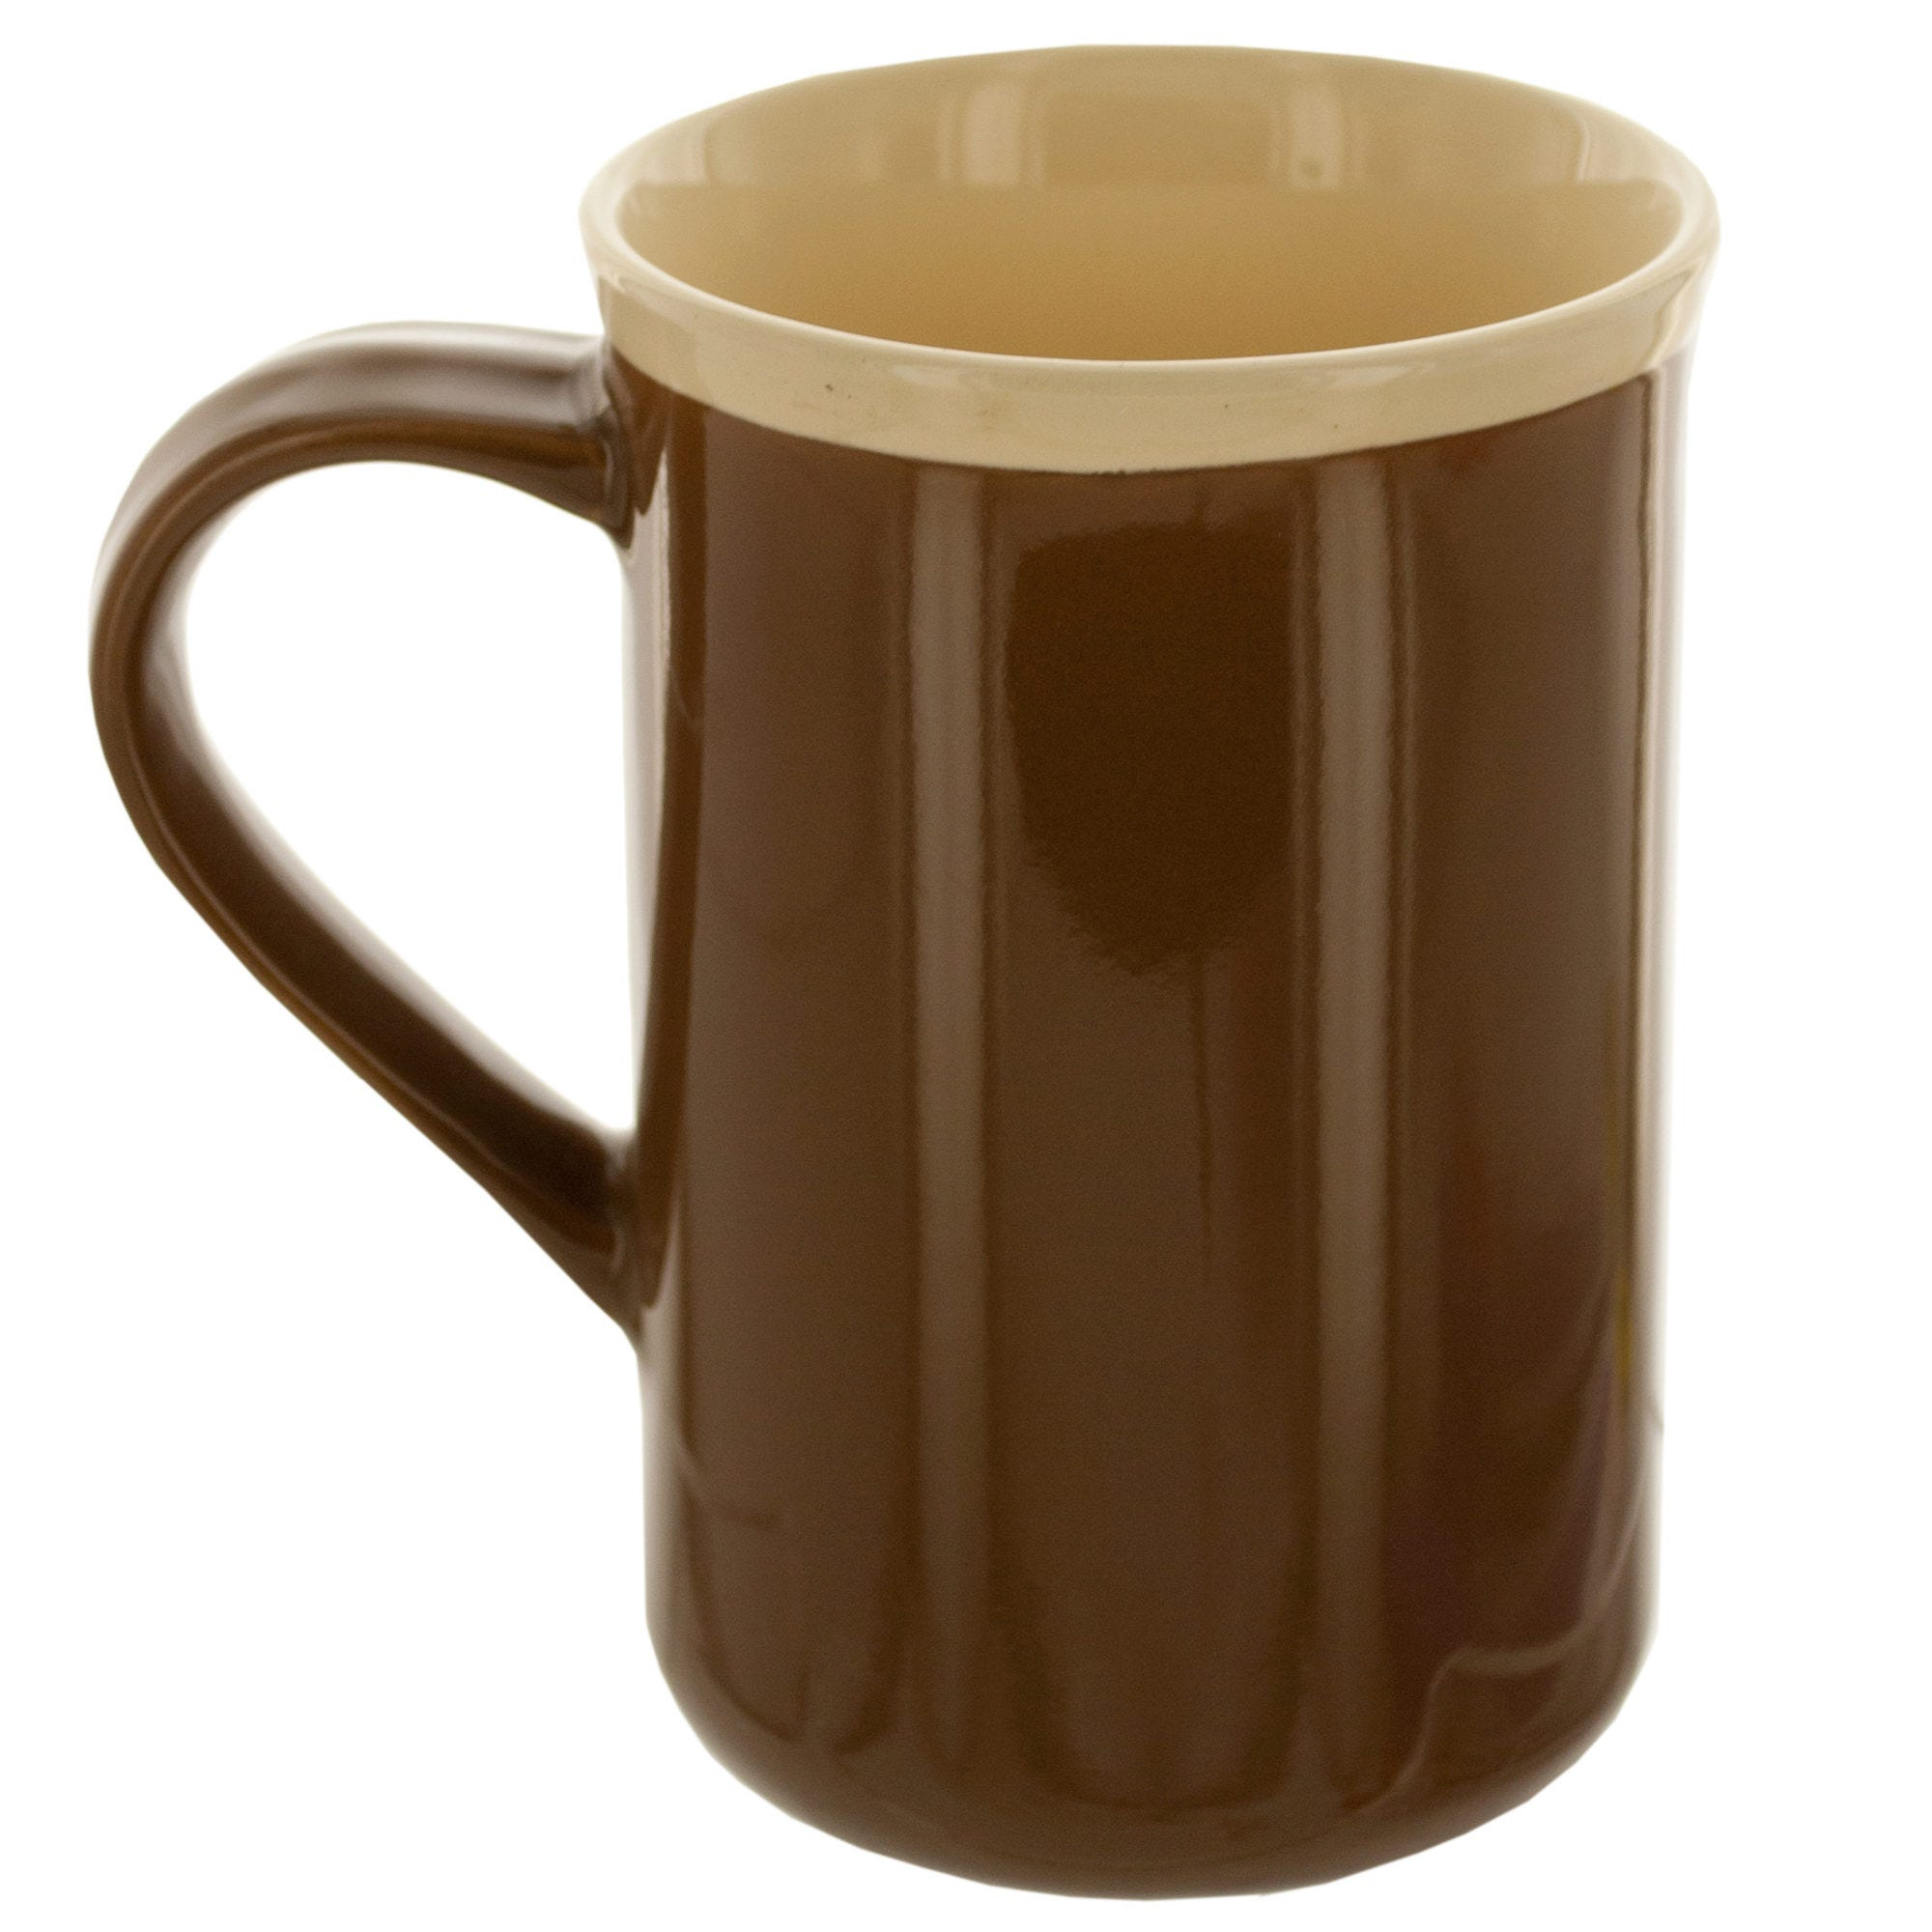 14-Ounce Tall Brown Ceramic MUG with Beige Rim- Qty 24